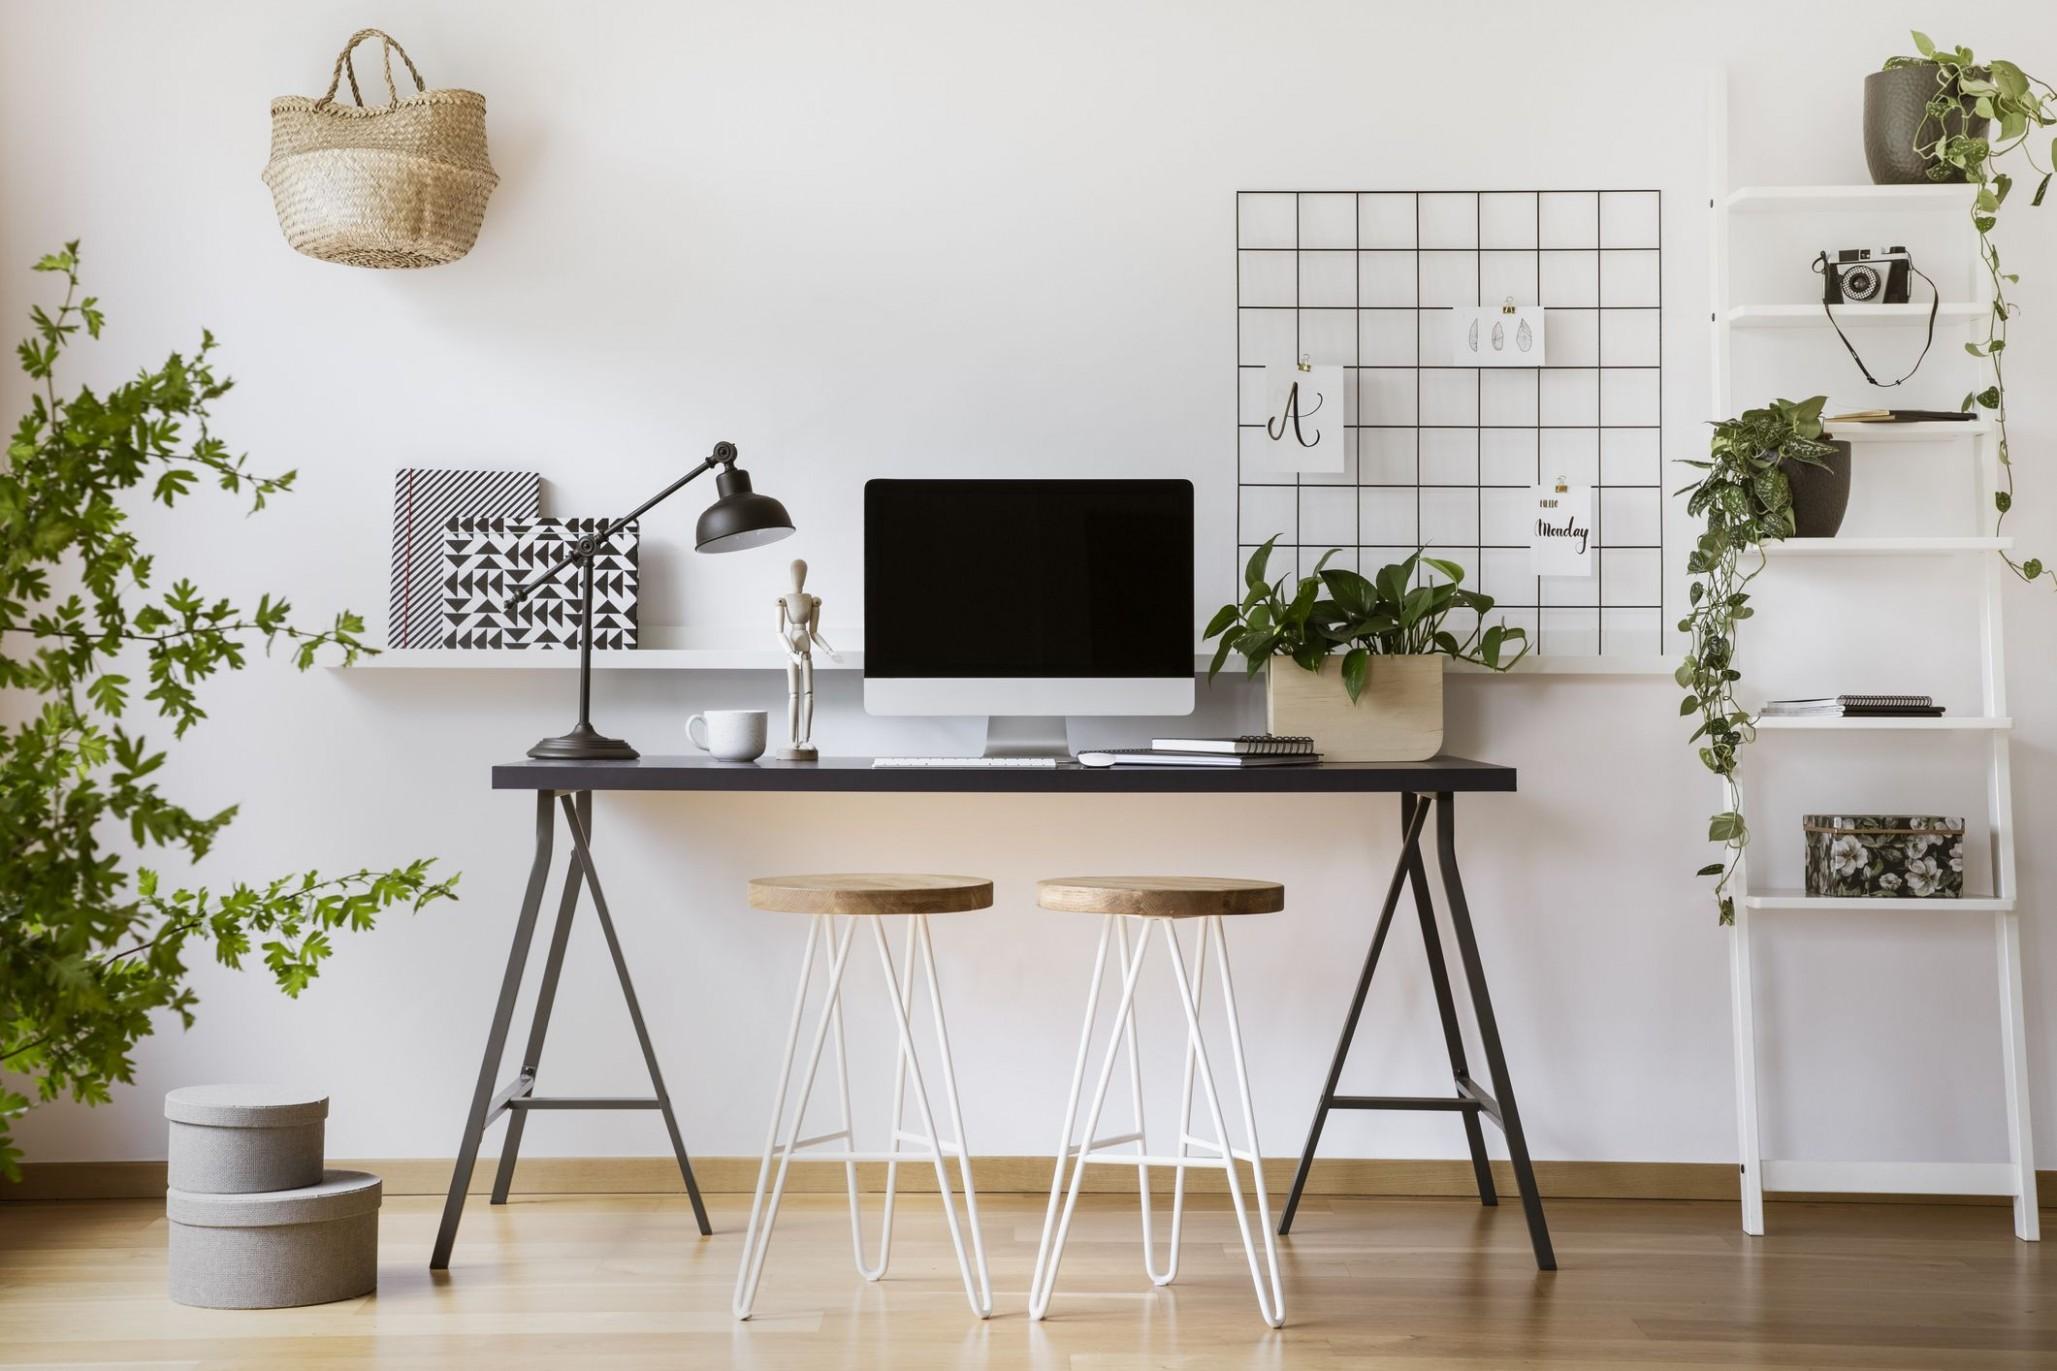 9 DIY Home Office Decor Ideas - Best Home Office Decor Projects - Home Office Ideas Cheap